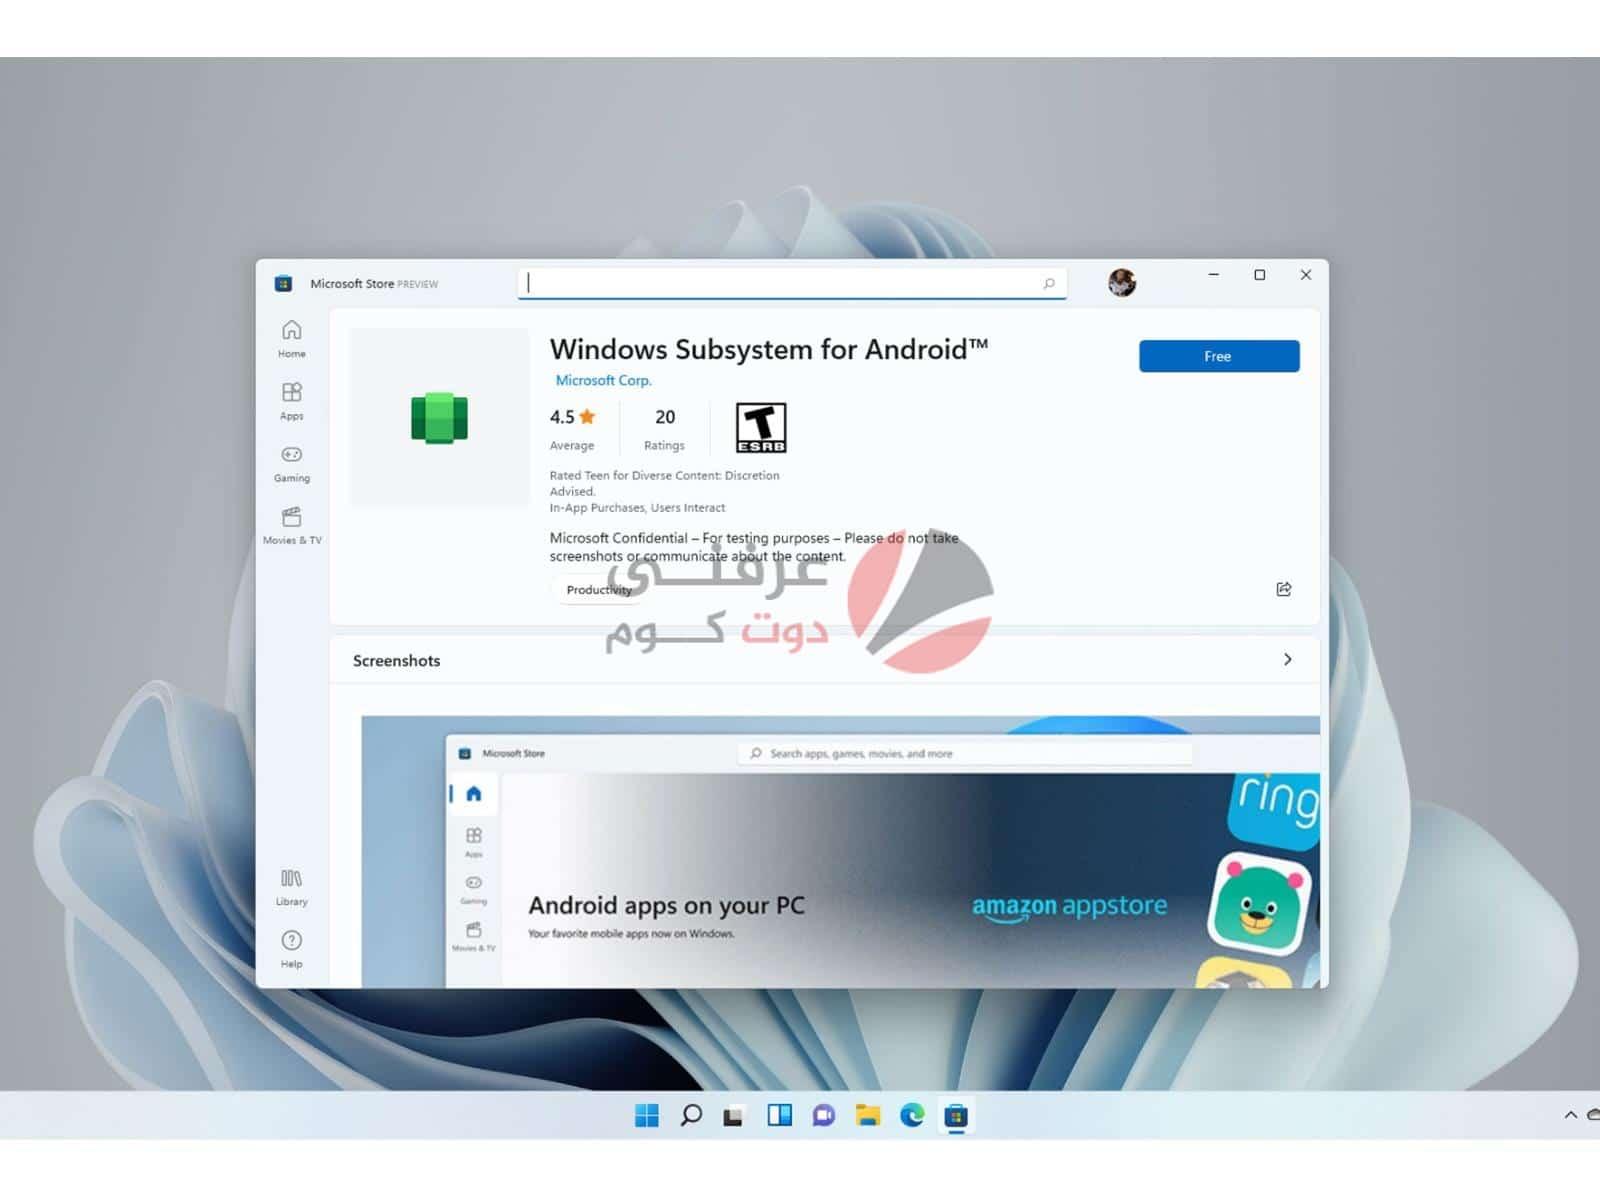 Windows 11 : يظهر نظام ويندوز الفرعي لنظام Android في متجر مايكروسوفت 1